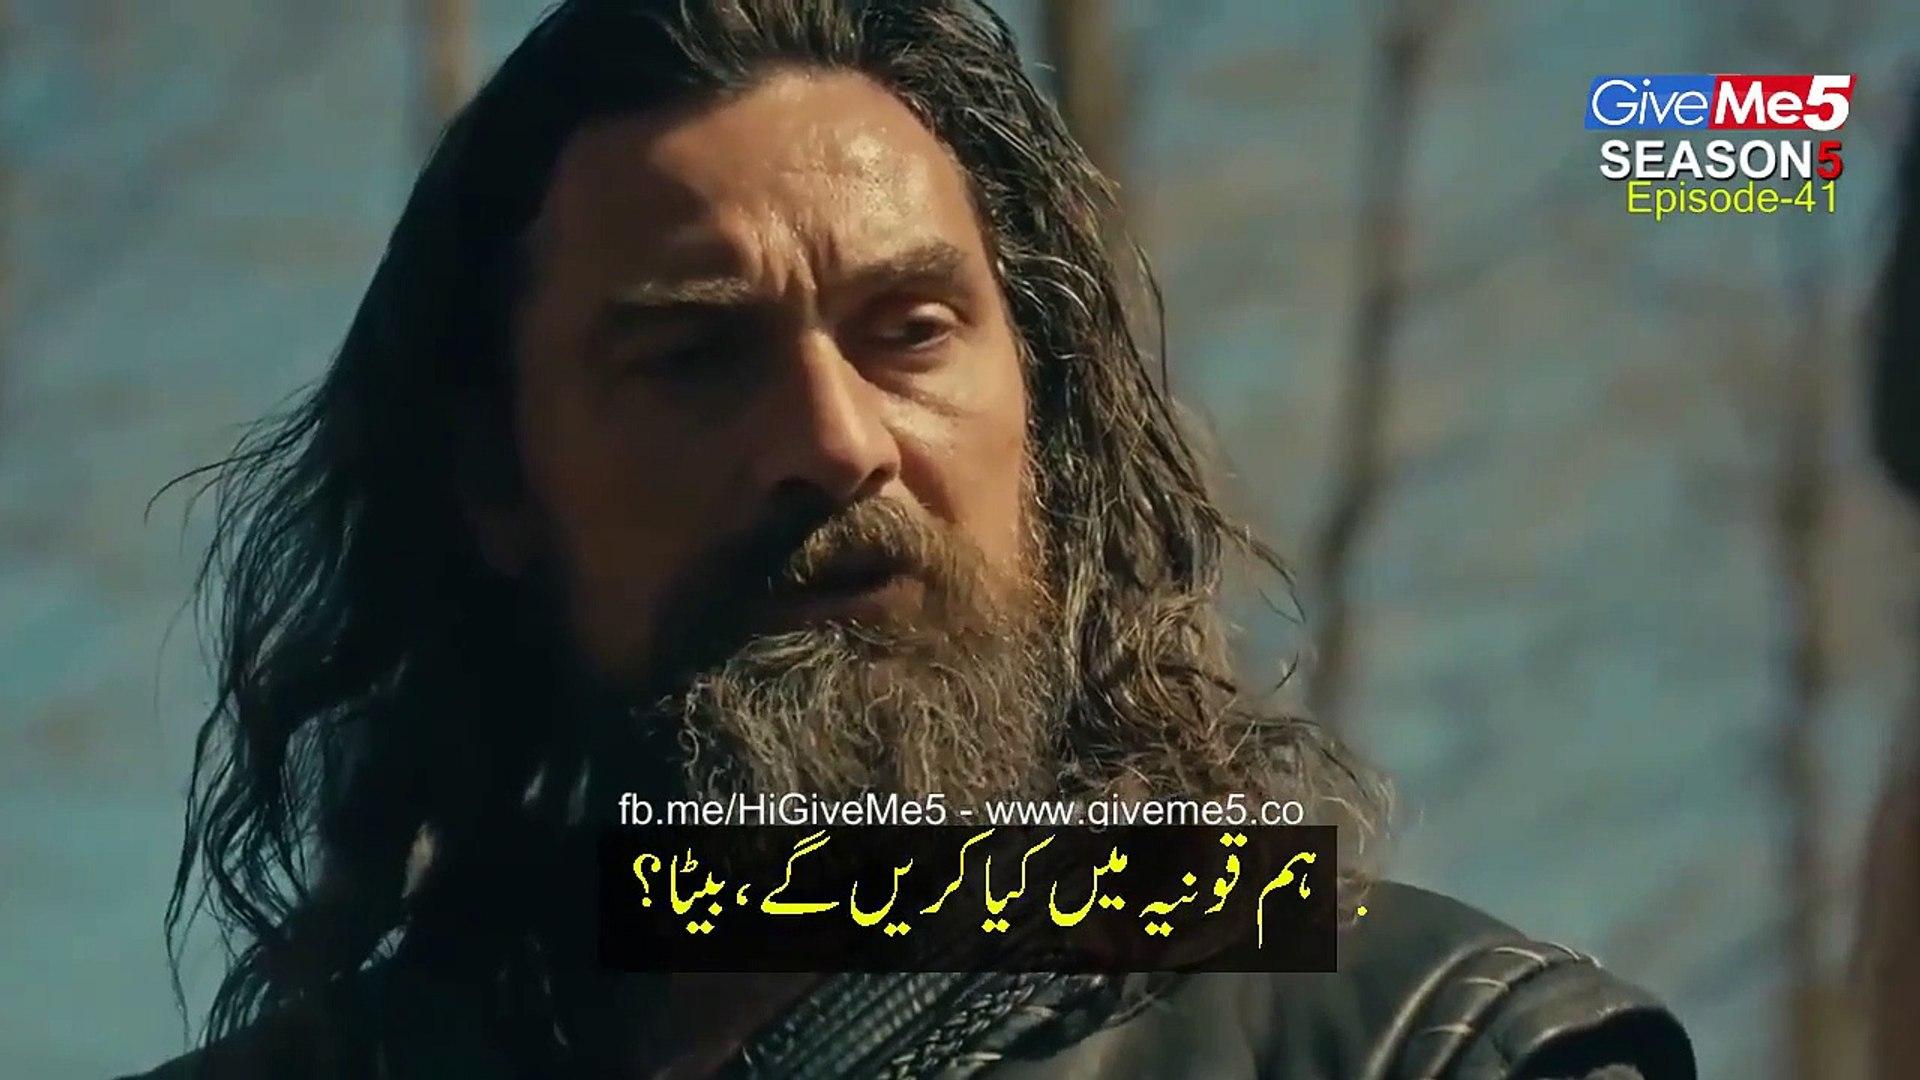 Dirilis Ertugrul Ghazi Season 5 in Urdu Subtitle Episode 41 & 42